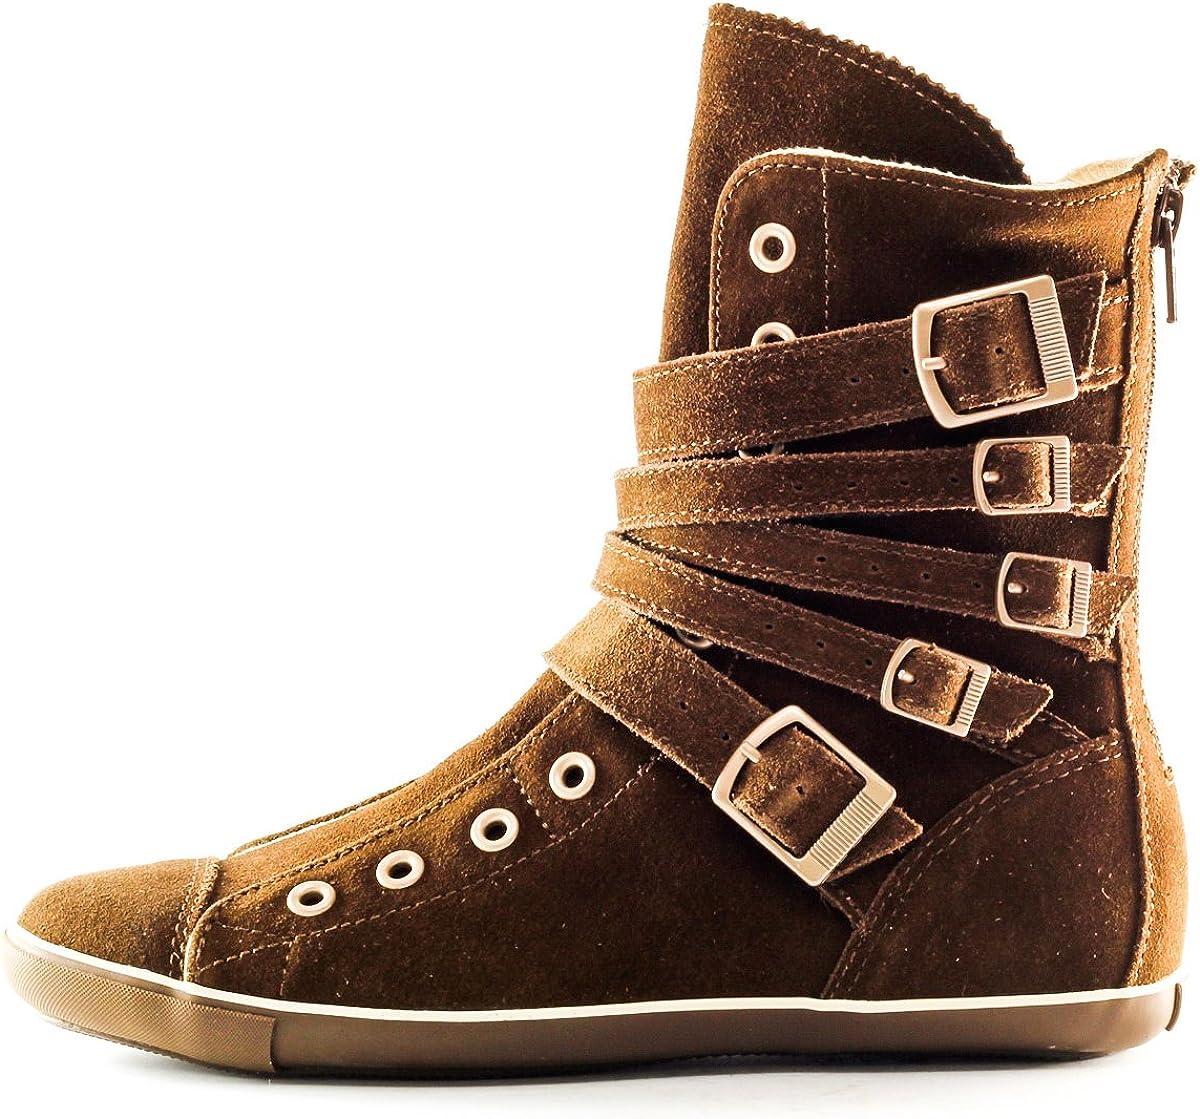 Star Light Multi Strap Boot,5.5,Brown